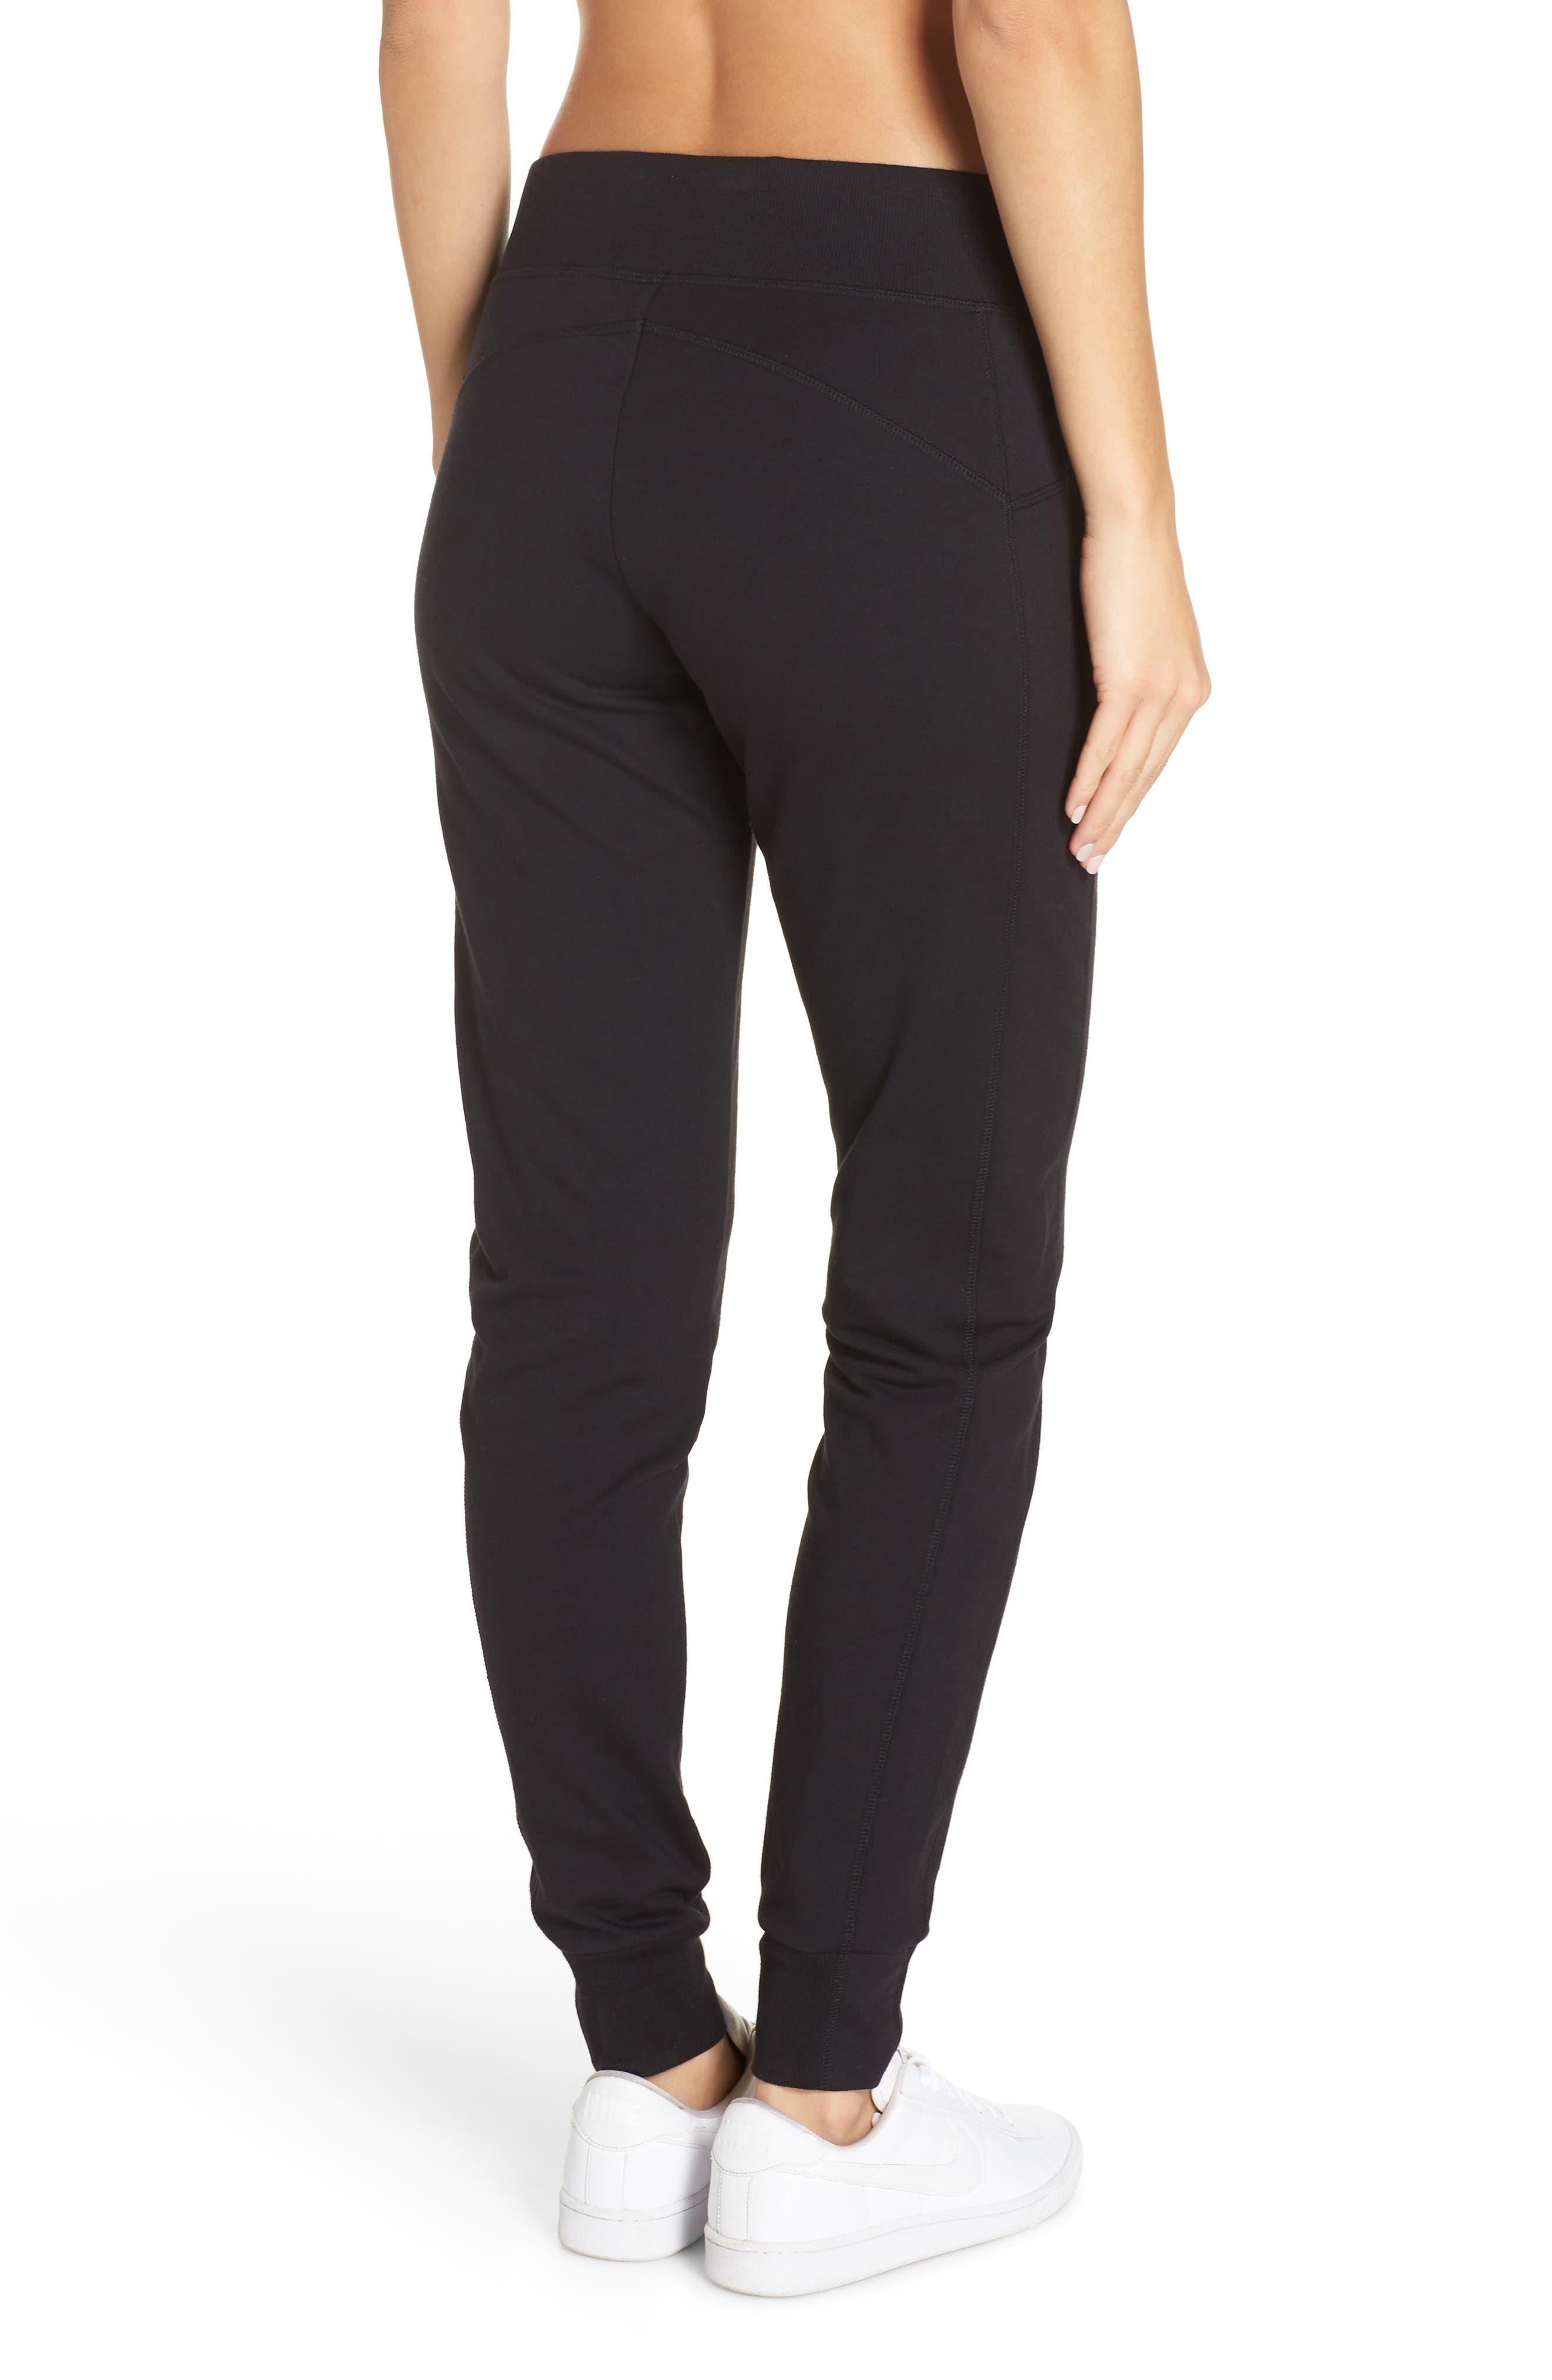 Taryn Sport Knit Pants,                             Alternate thumbnail 2, color,                             Black